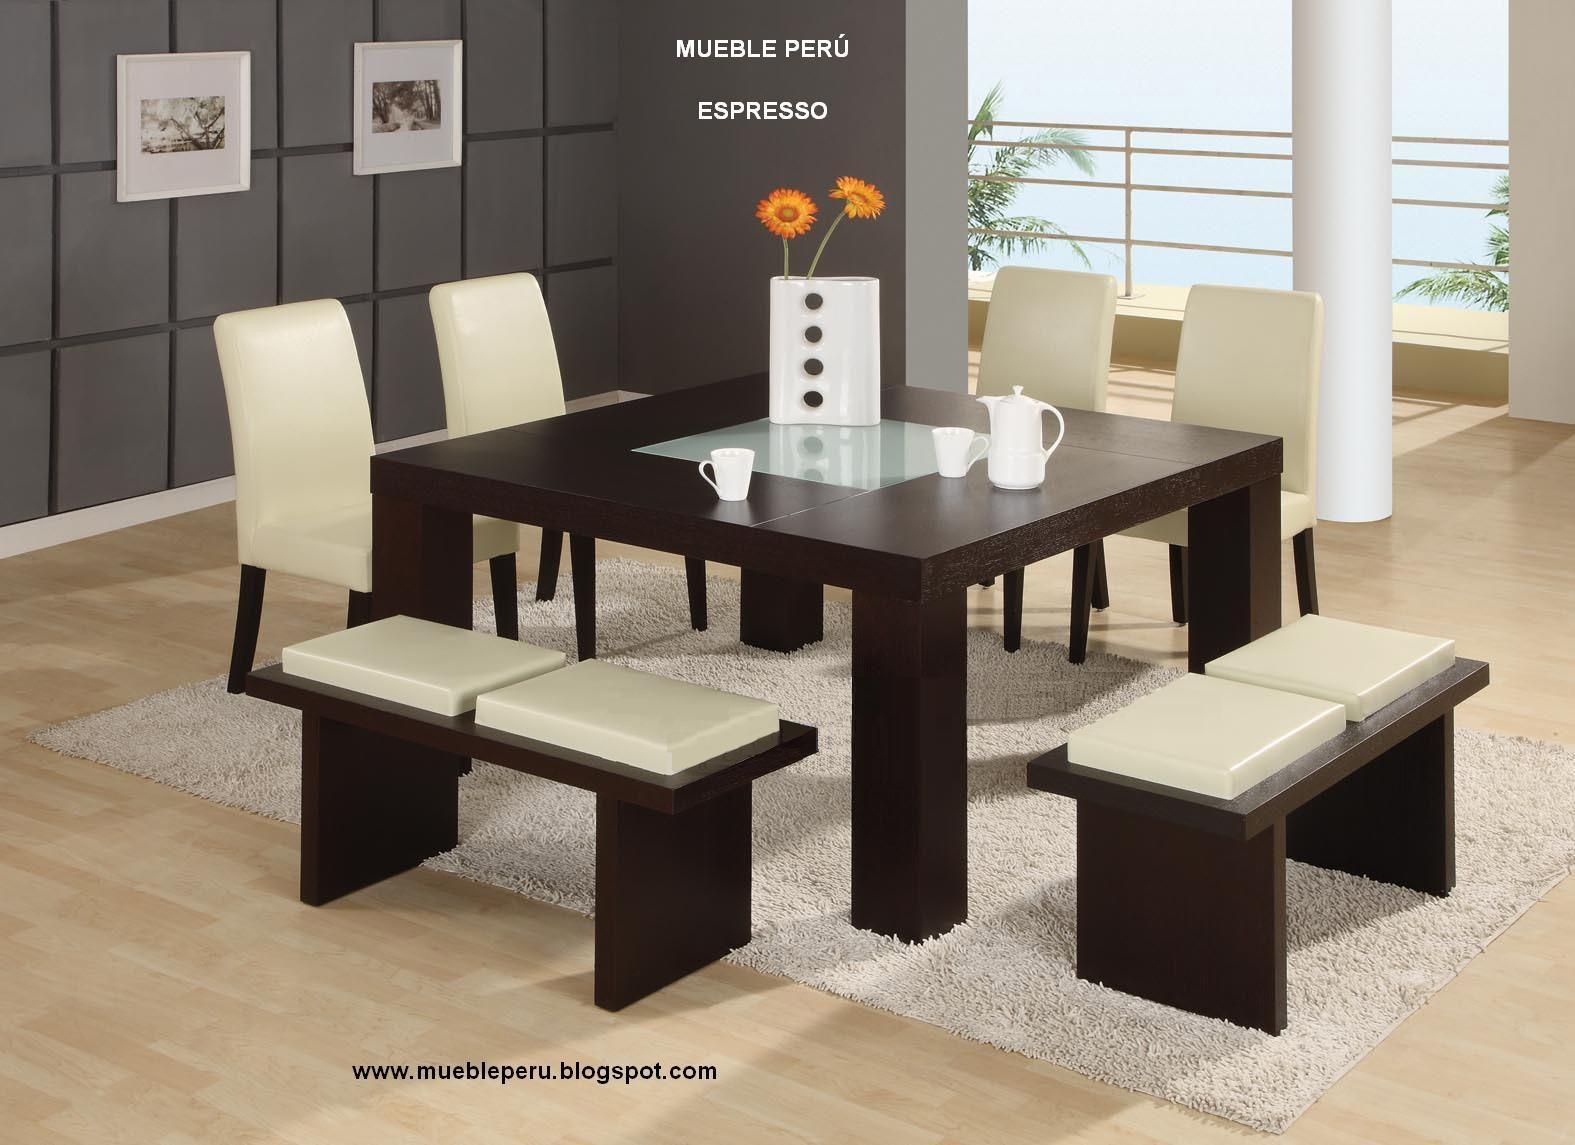 Mesa comedor modelo 02 juegos de comedor comedores for Modelos de muebles modernos para living